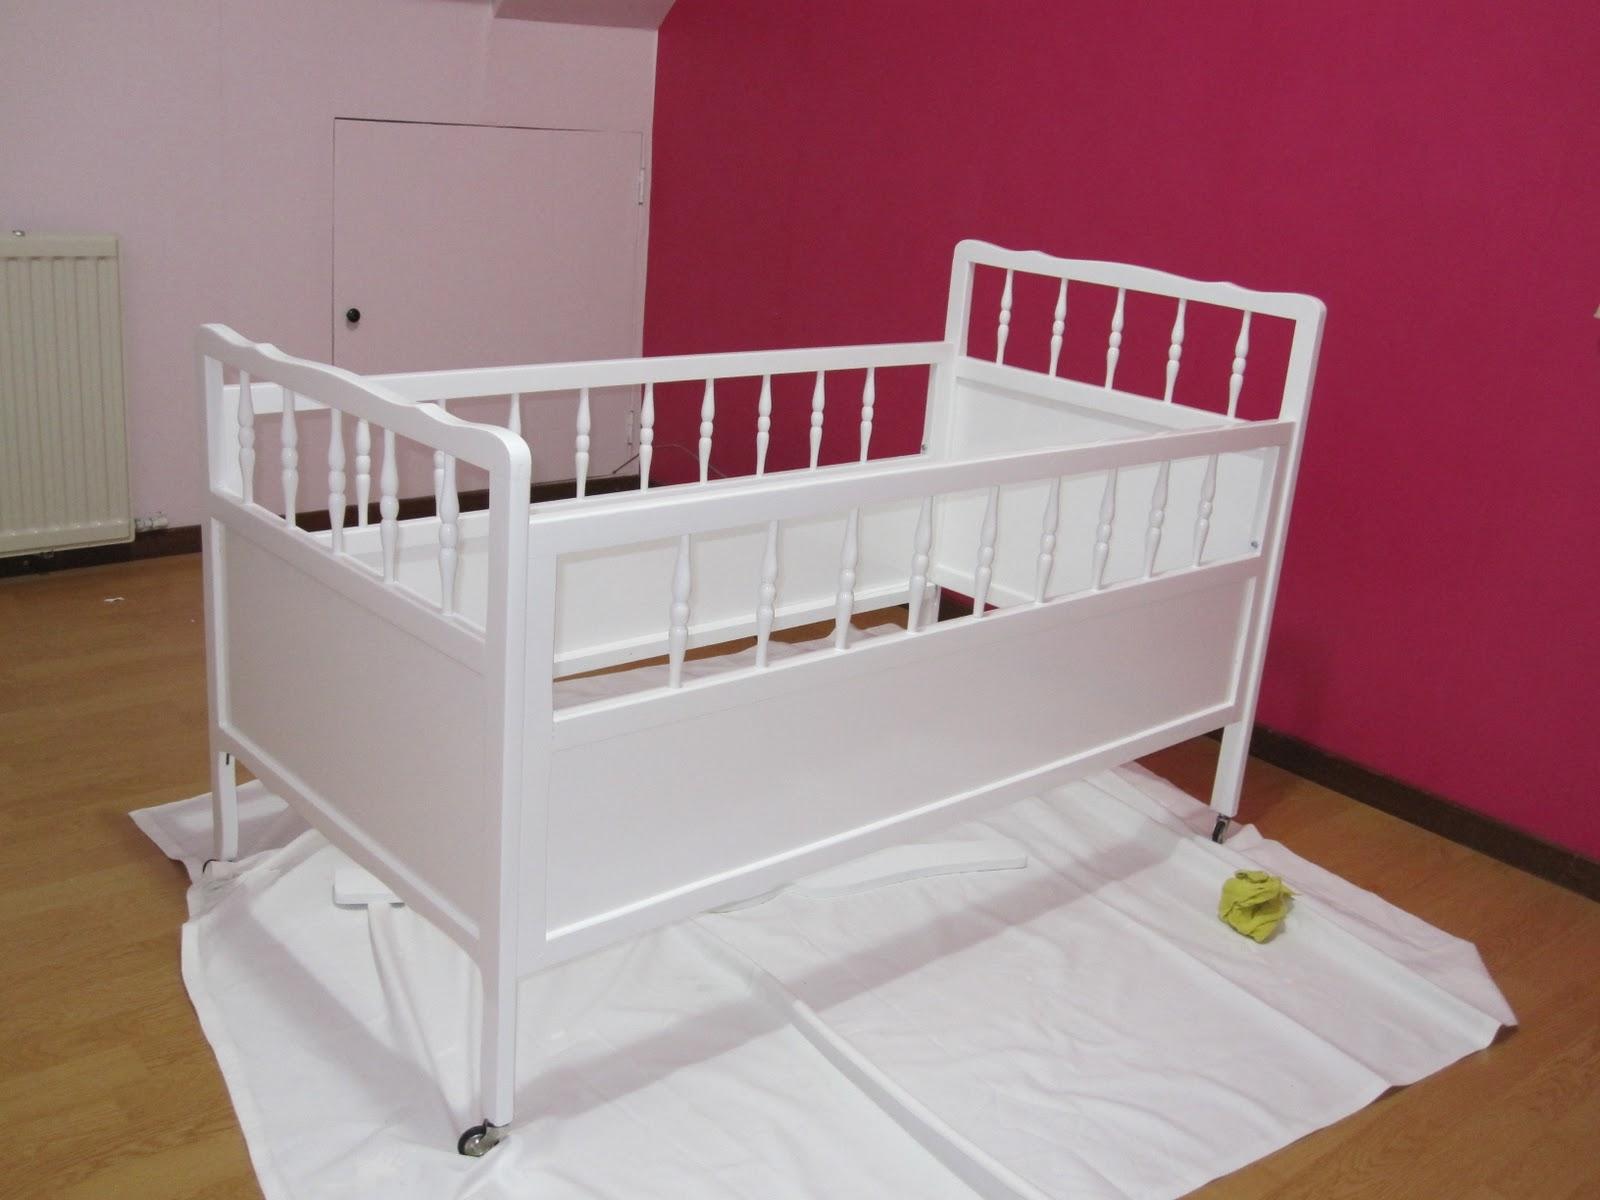 Hemeltje ledikant prenatal. free hemel hemeltje babybed ledikant